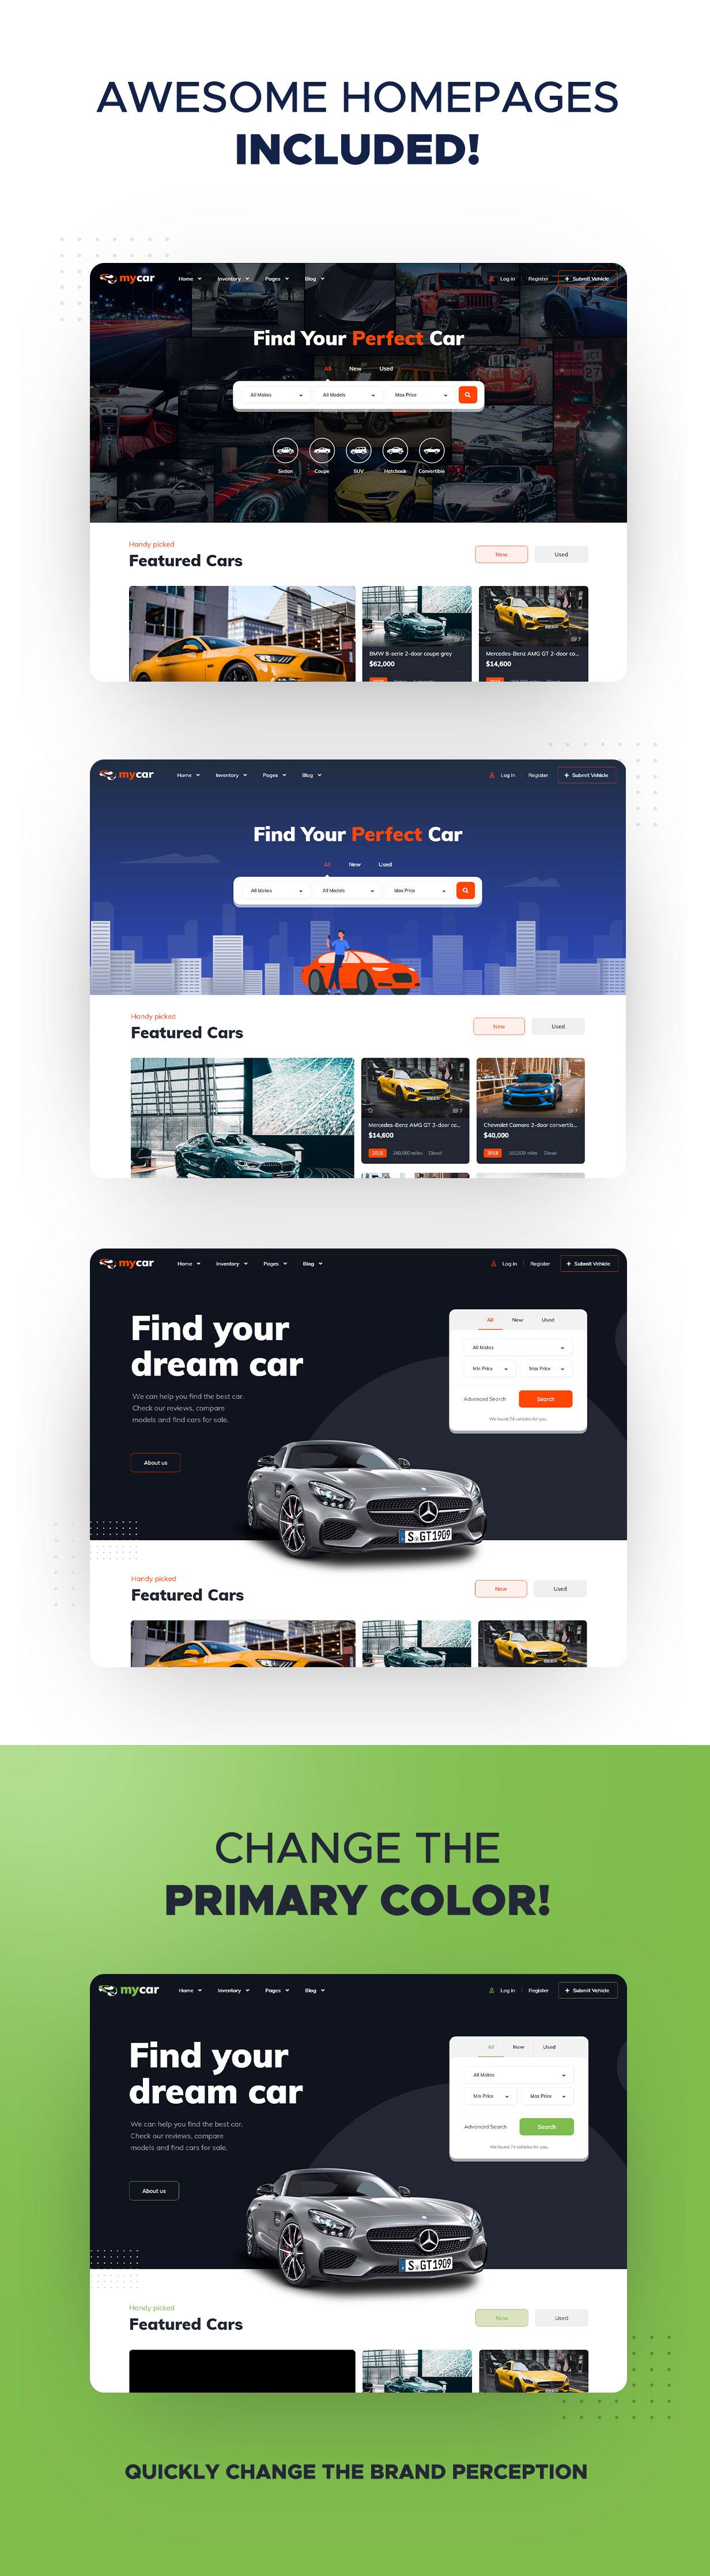 Vehica - Car Dealer & Directory Listing - 9